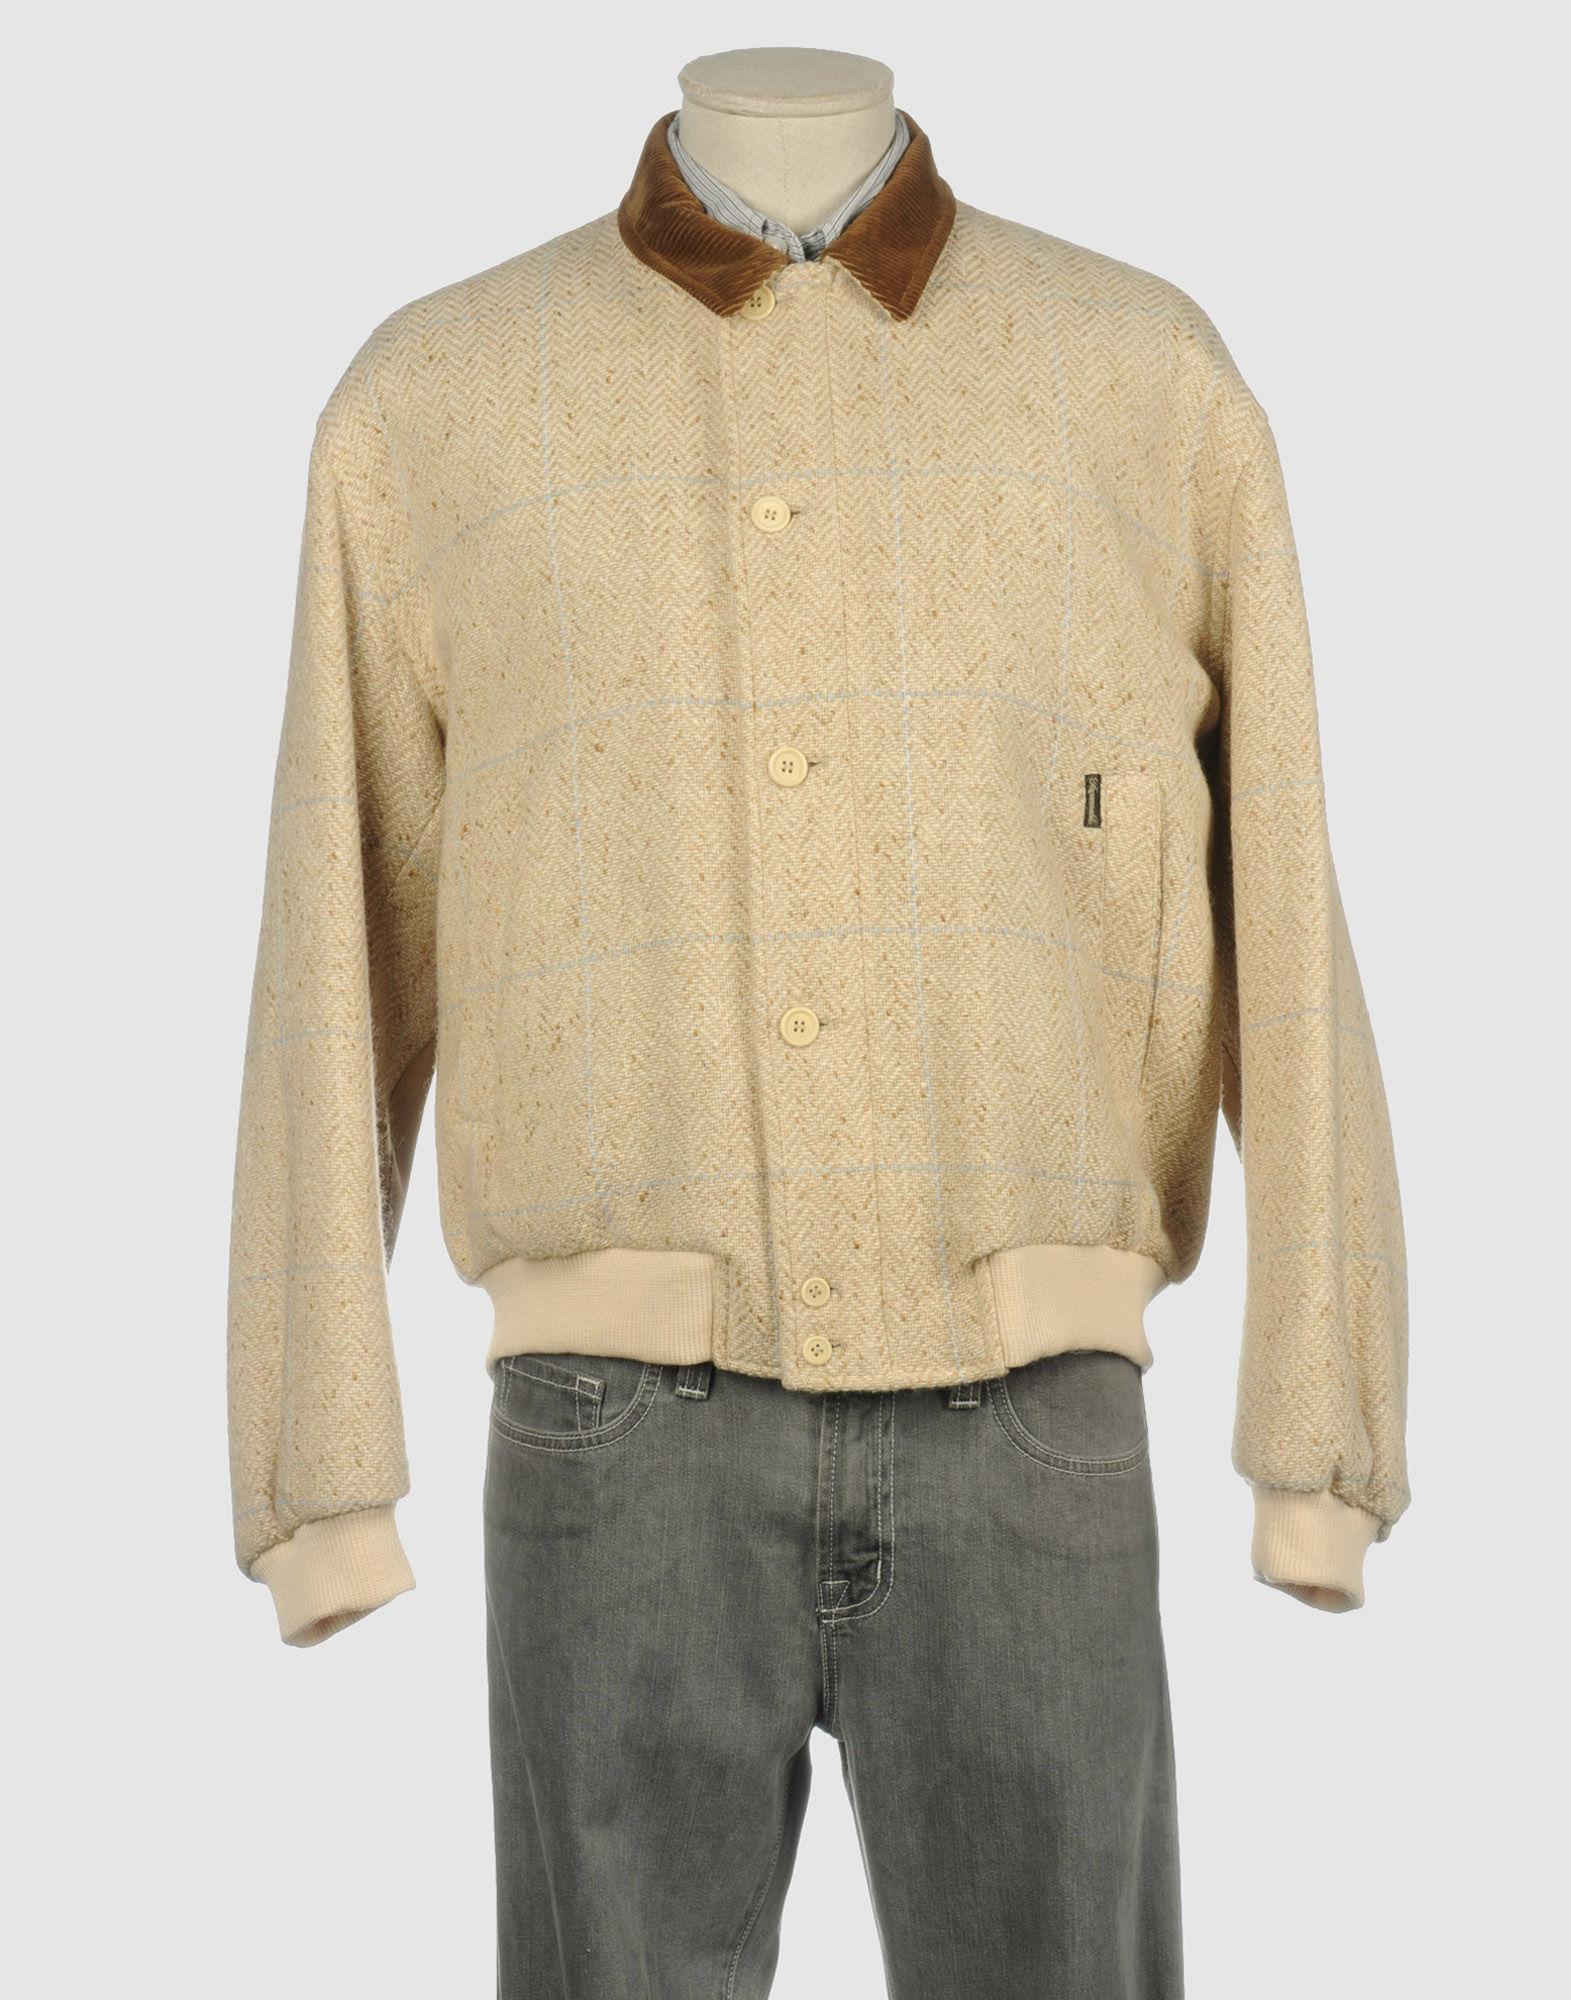 Faconnable Jacket In Beige For Men Lyst